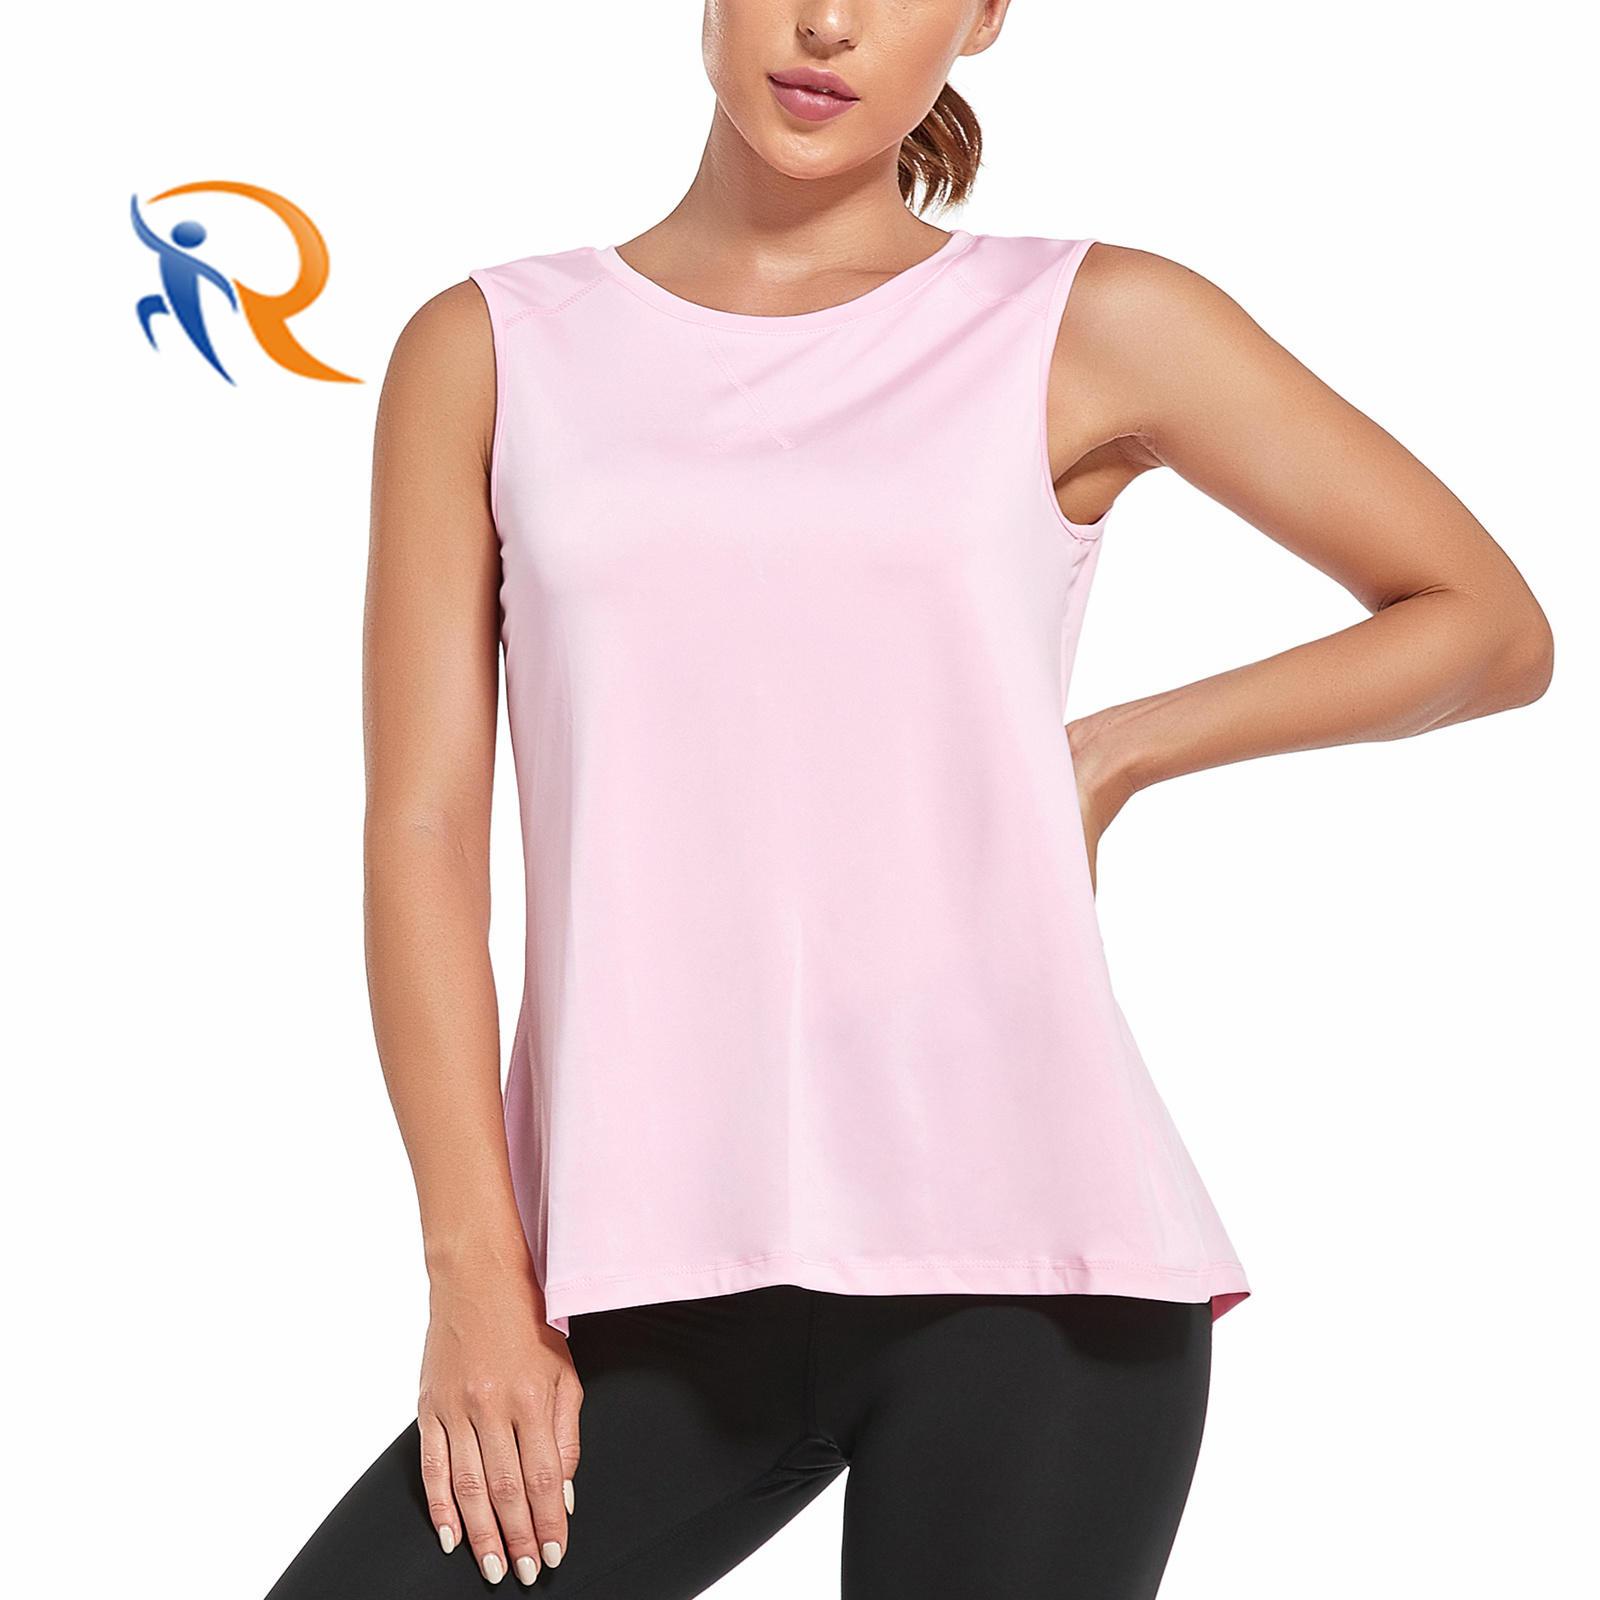 Elastic Fabric Sports Tops Running T Shirt Woman Athletic Vest